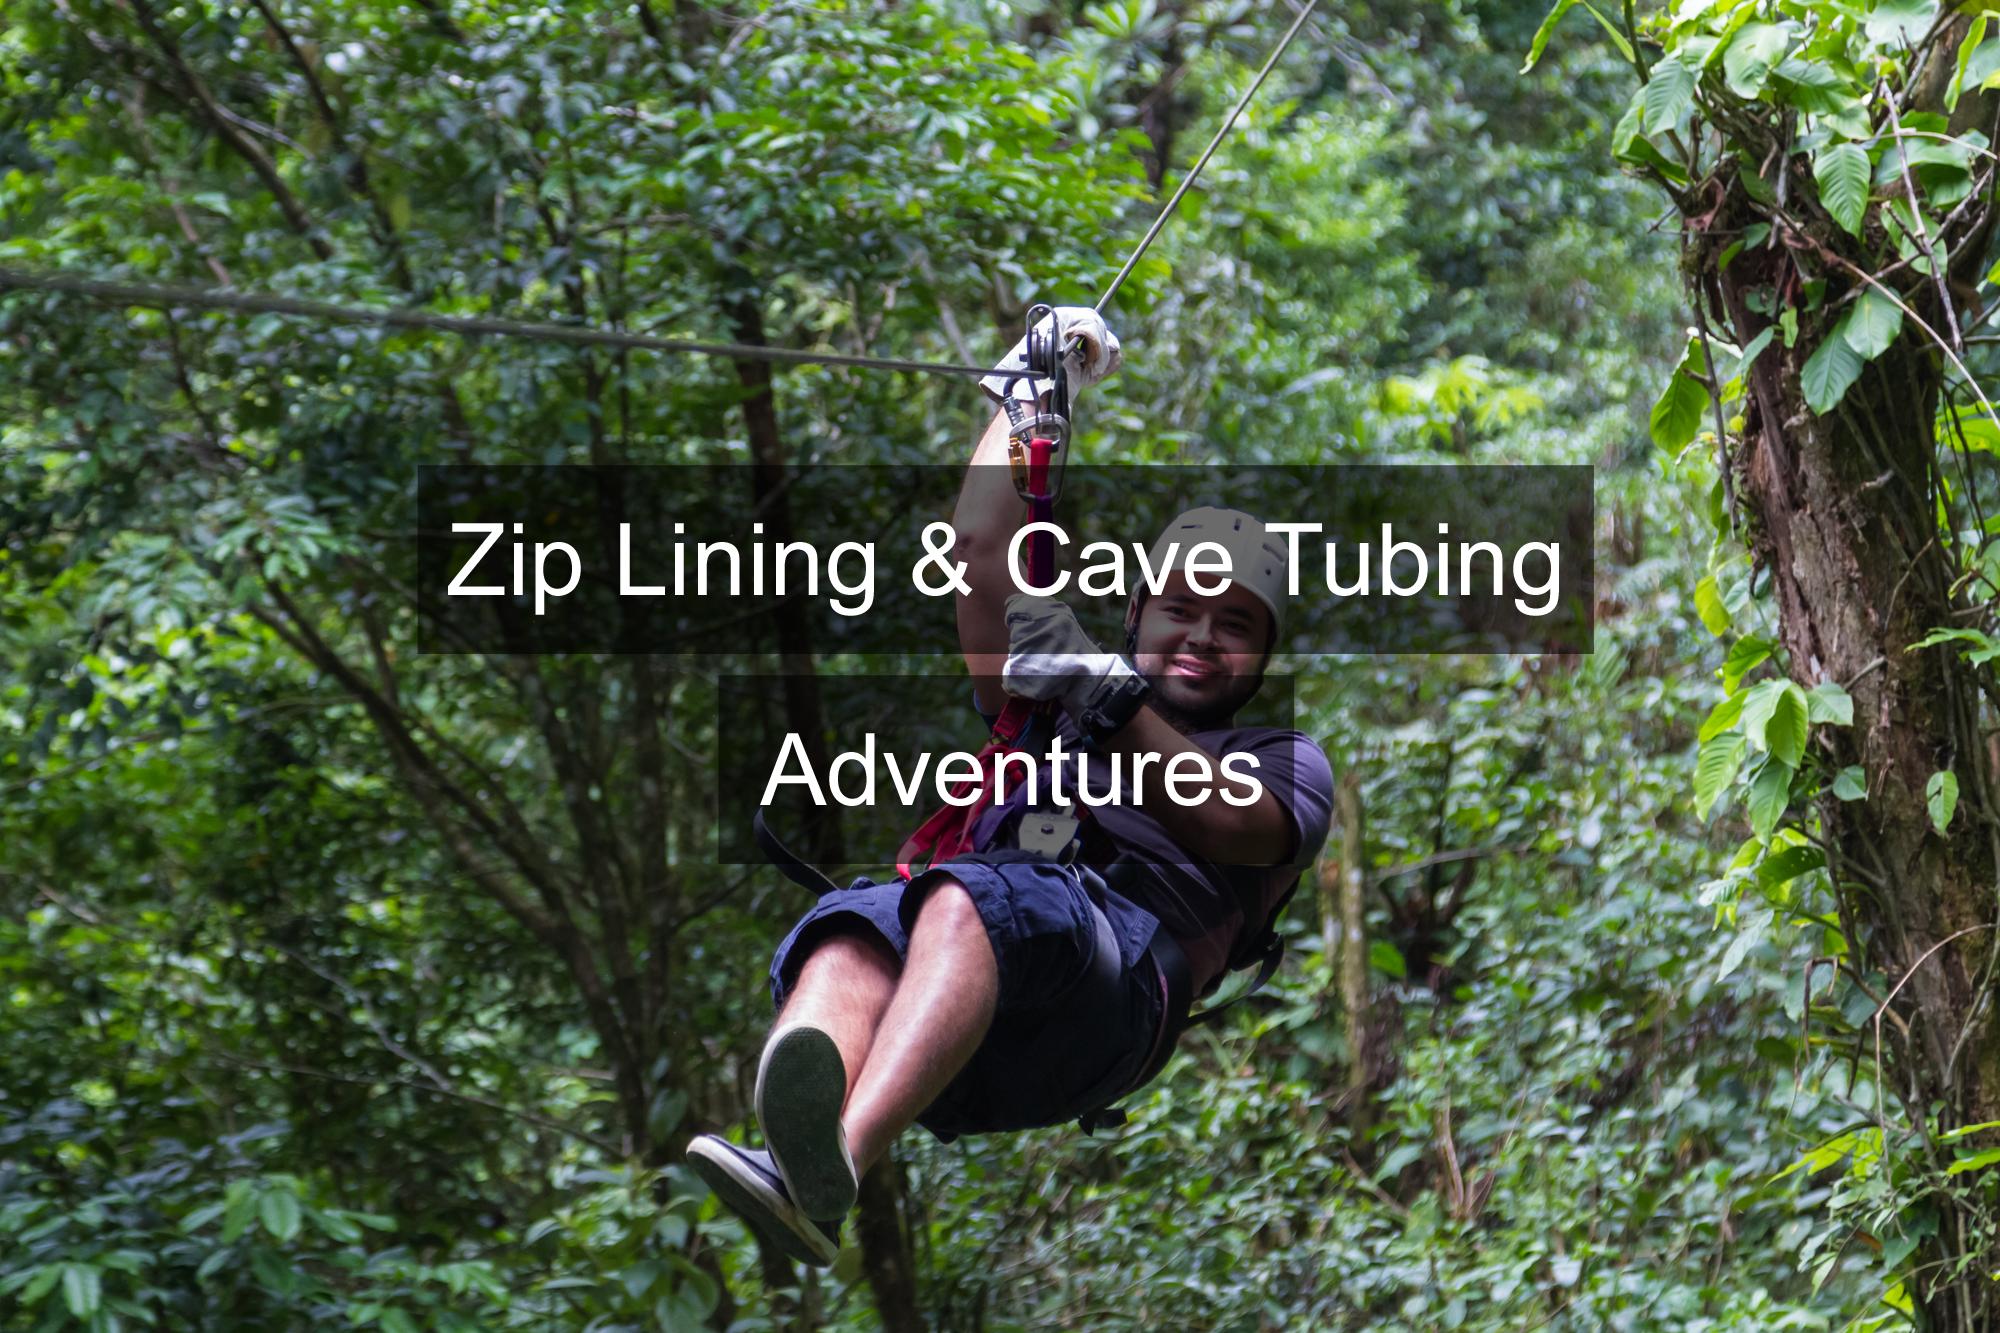 The Zip Lining & Cave Tubing Adventures